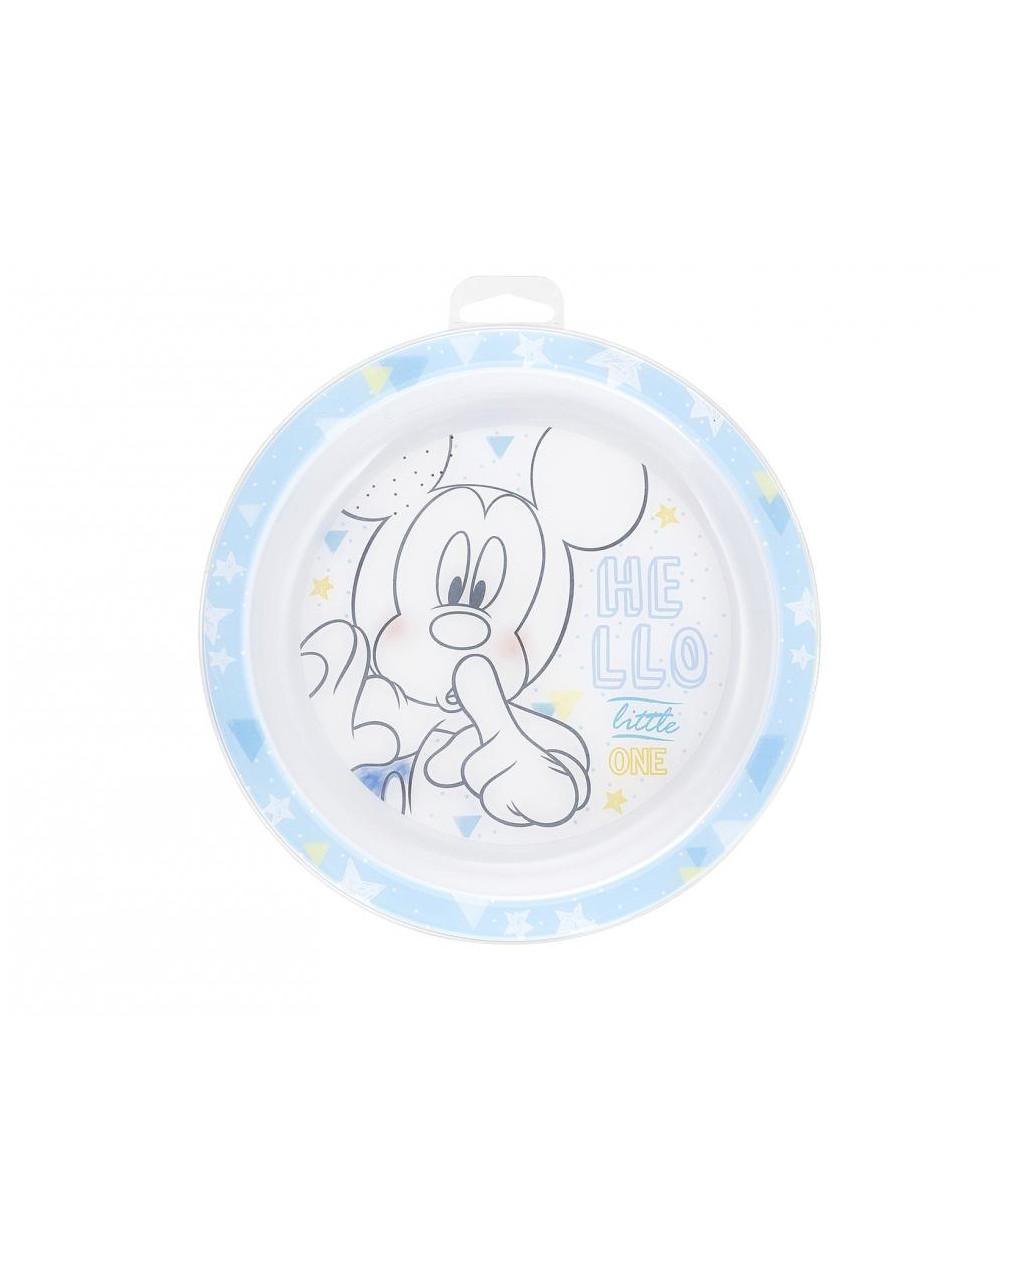 Piatto piano 21,5 cm mickey disney - Disney, Lulabi Disney